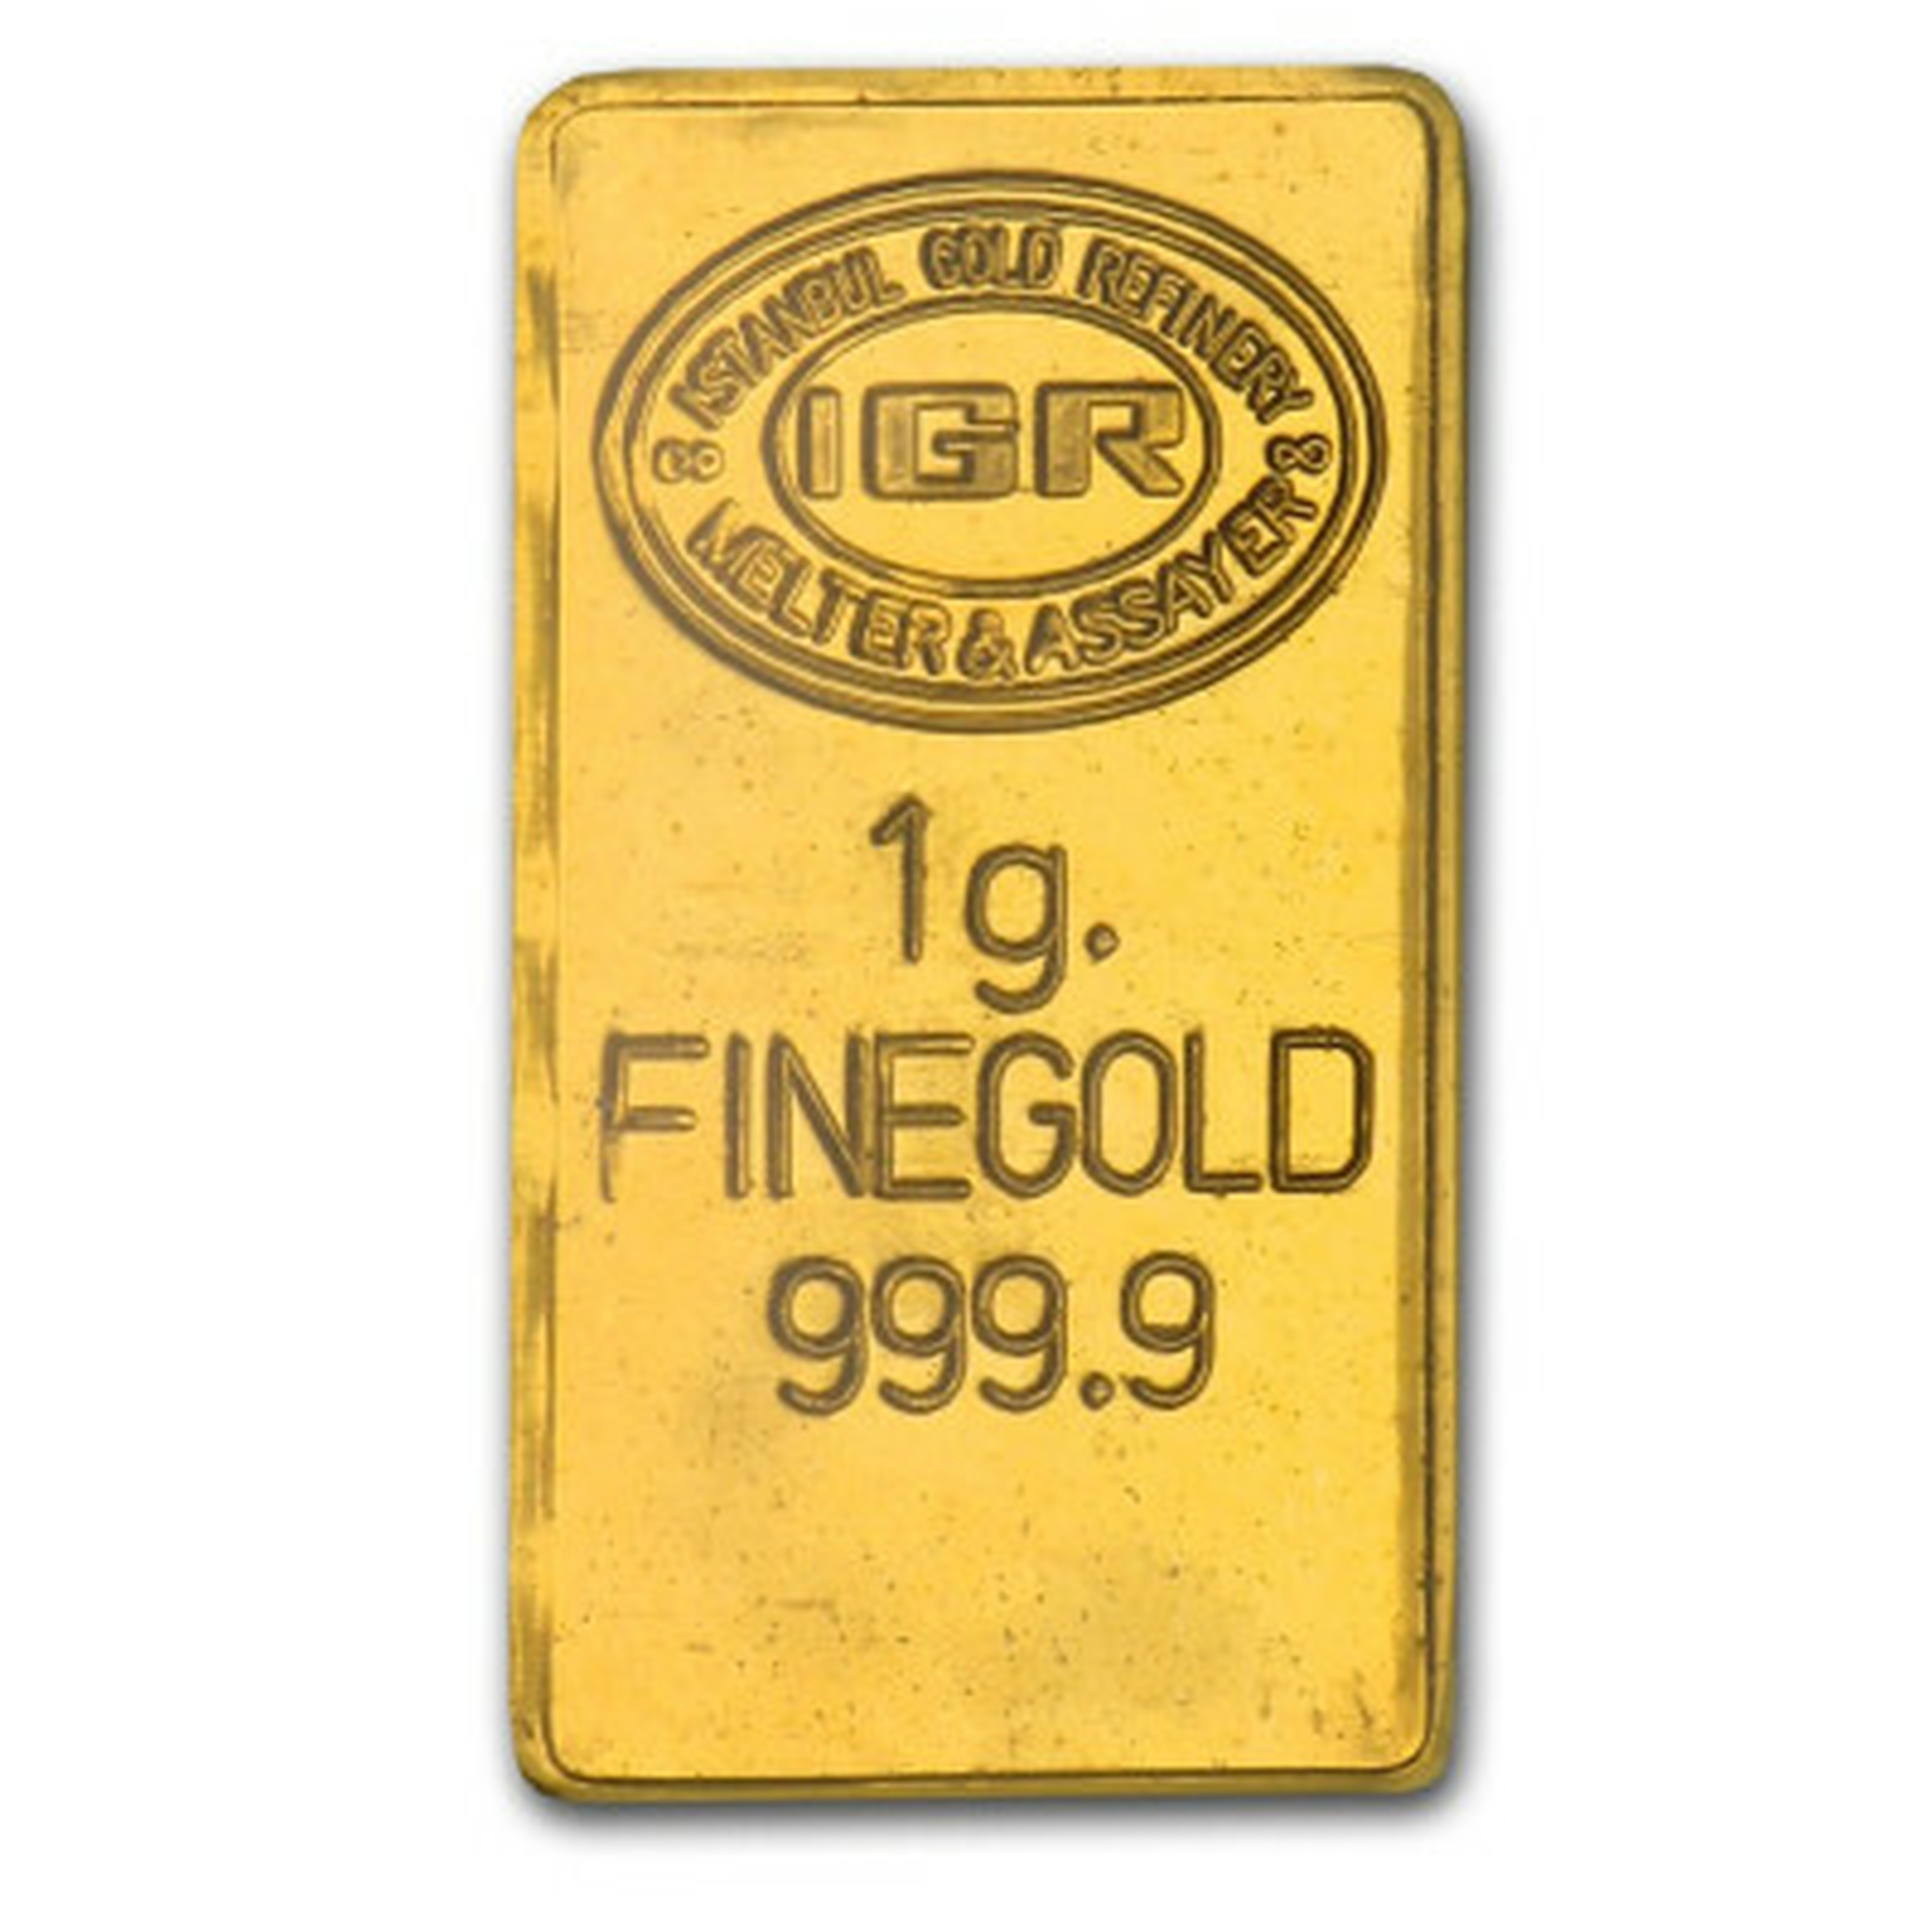 Gold bar 1 grams fine gold